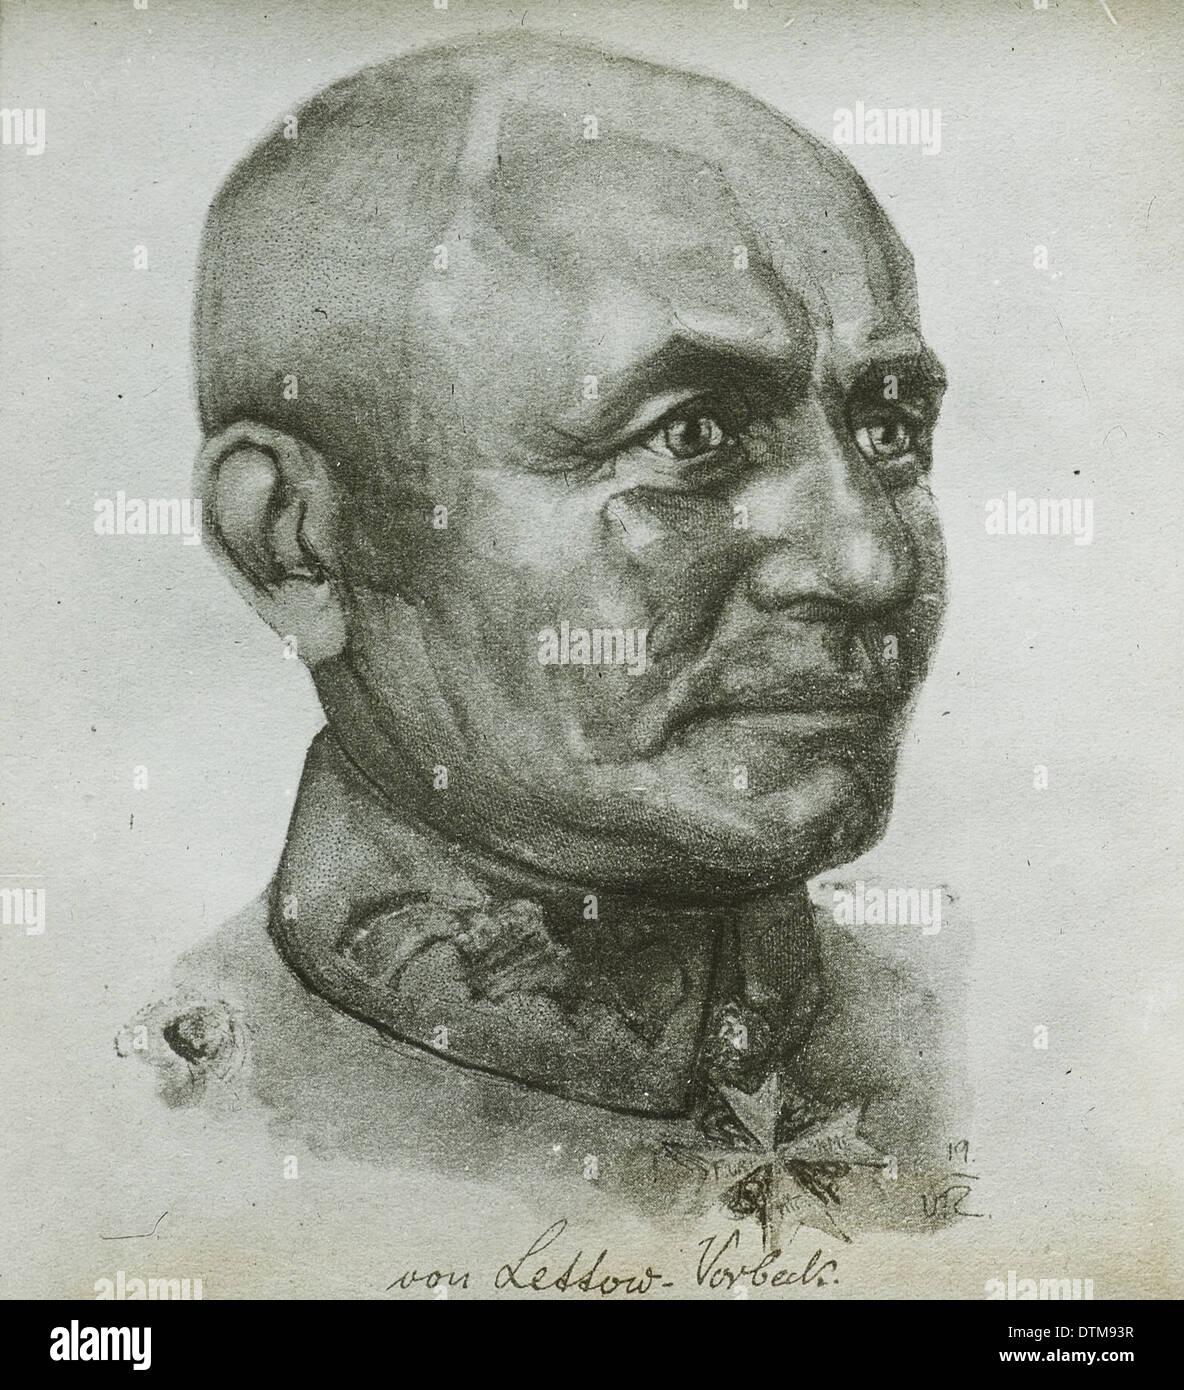 Von Lettow Vorbeck, ca. 1914-1924 (IMP-CSWC - Stock Image